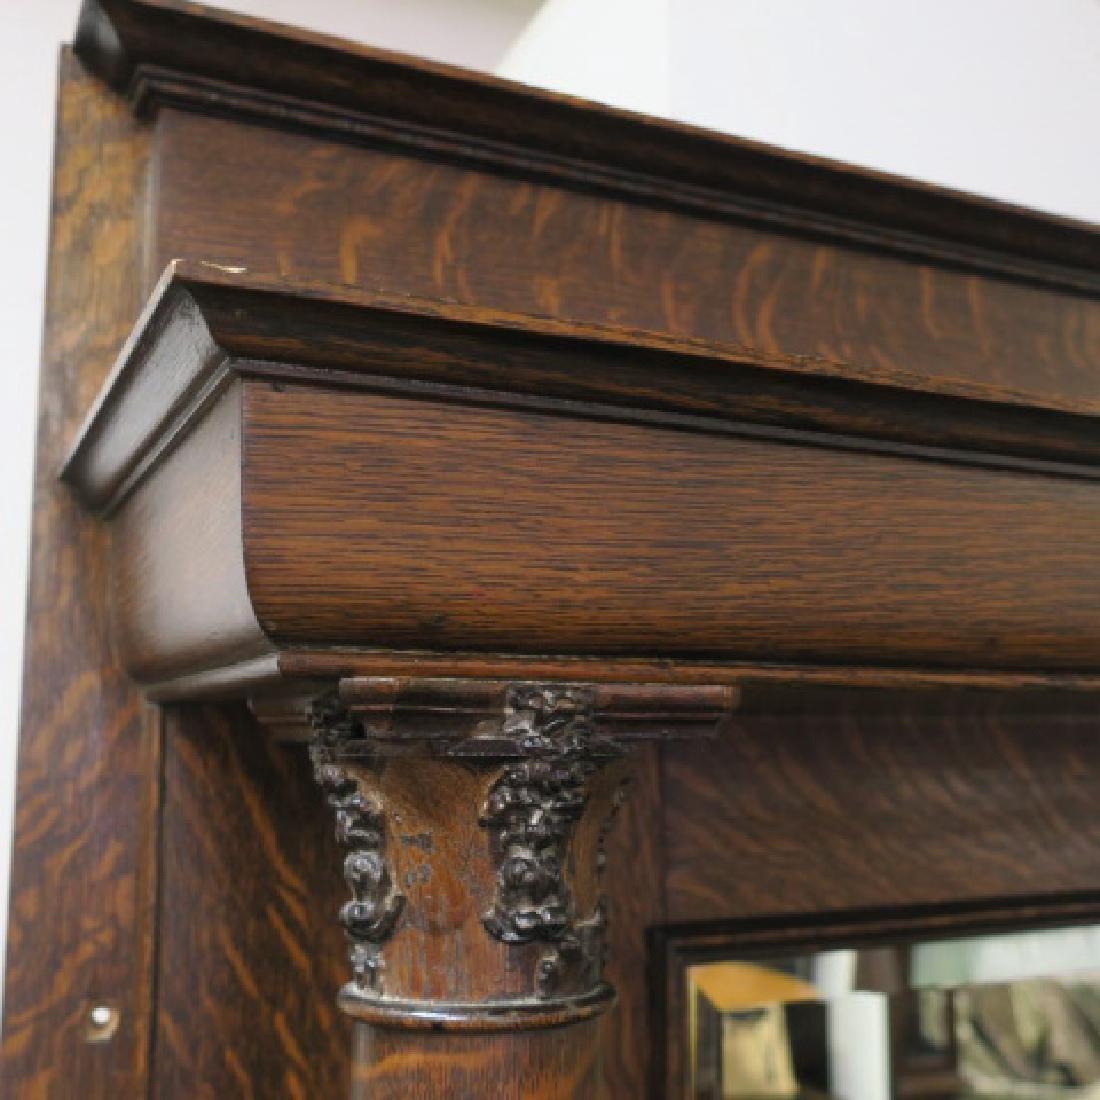 19th Century American Tiger Oak Mirror Back Mantle: - 3